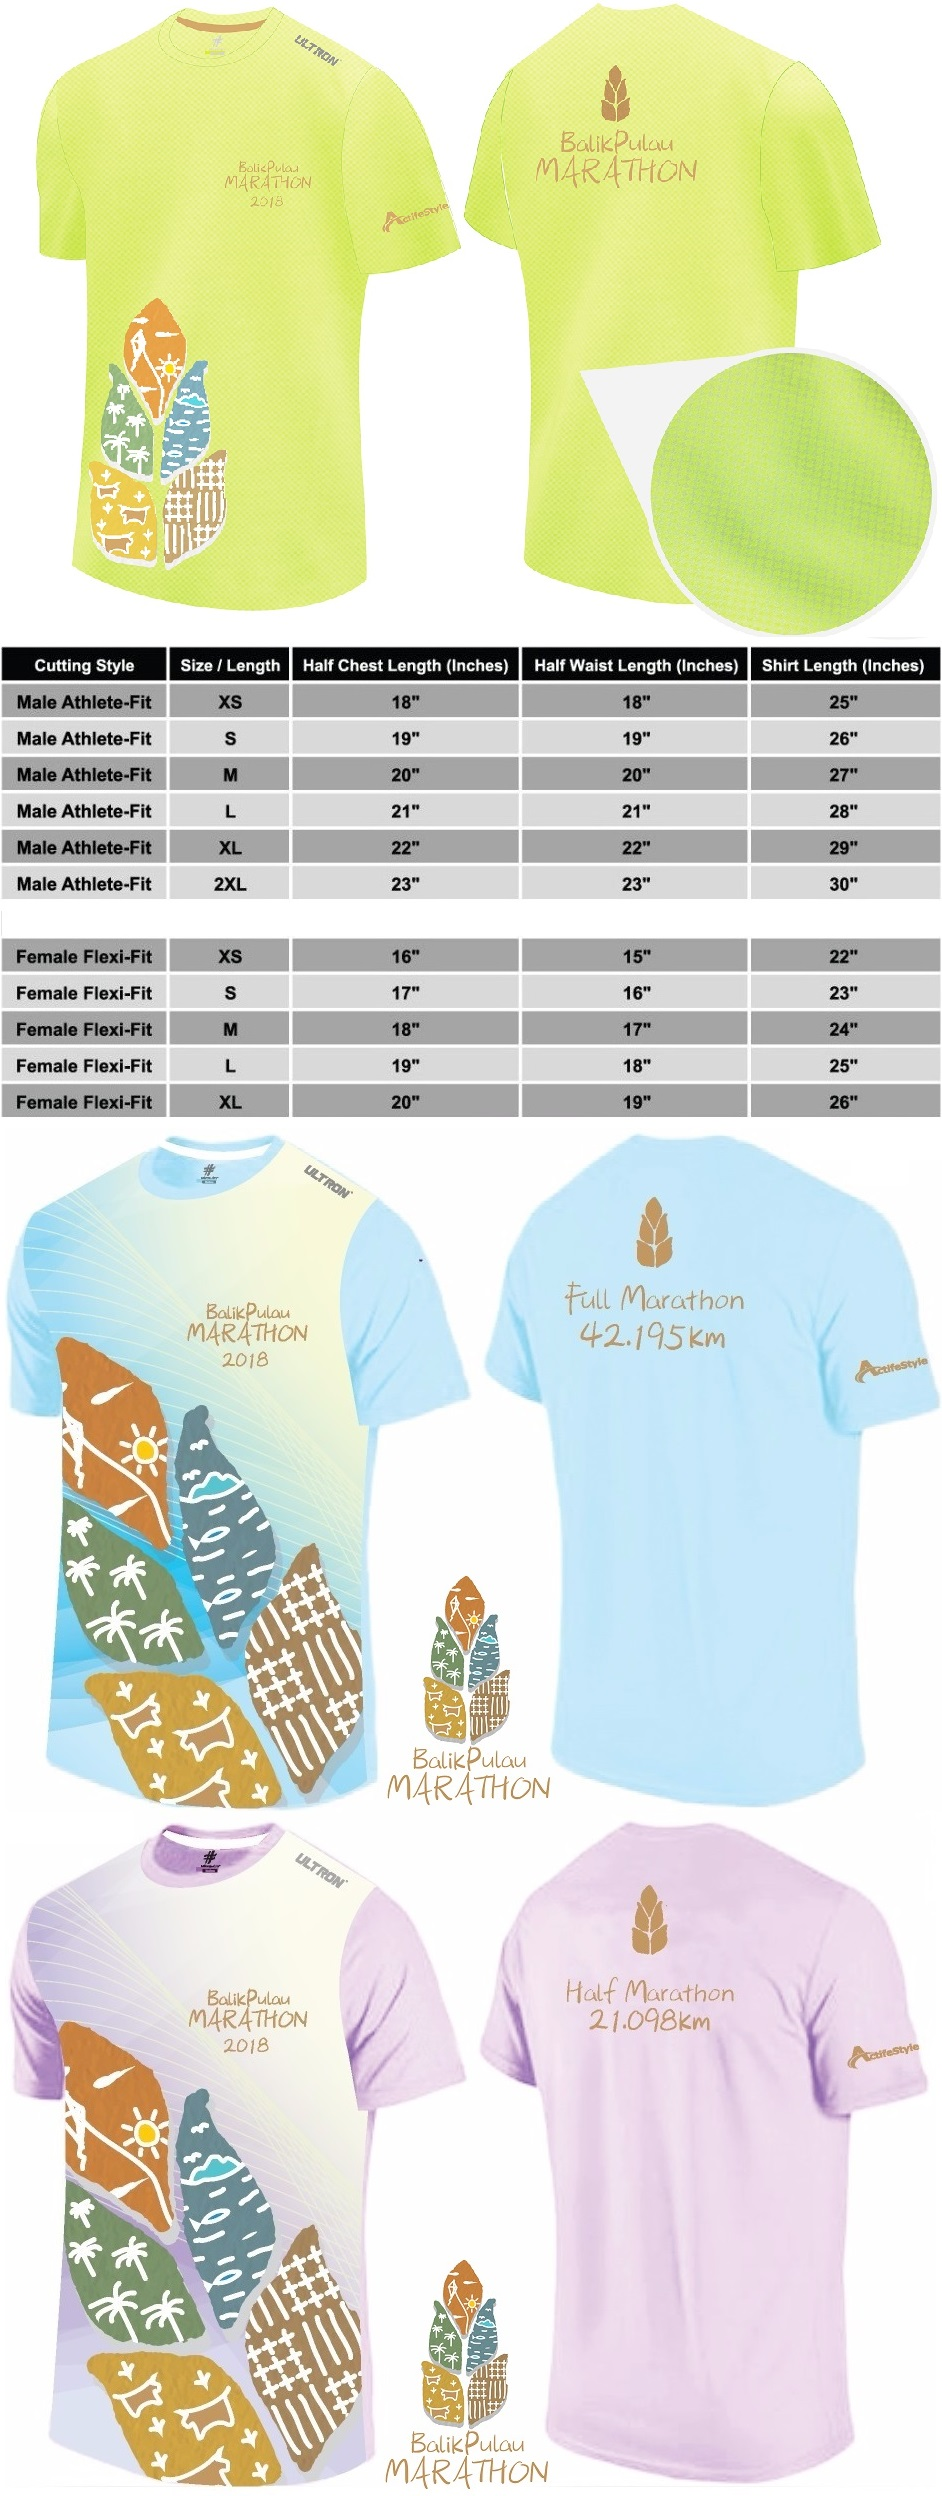 Balik Pulau Marathon